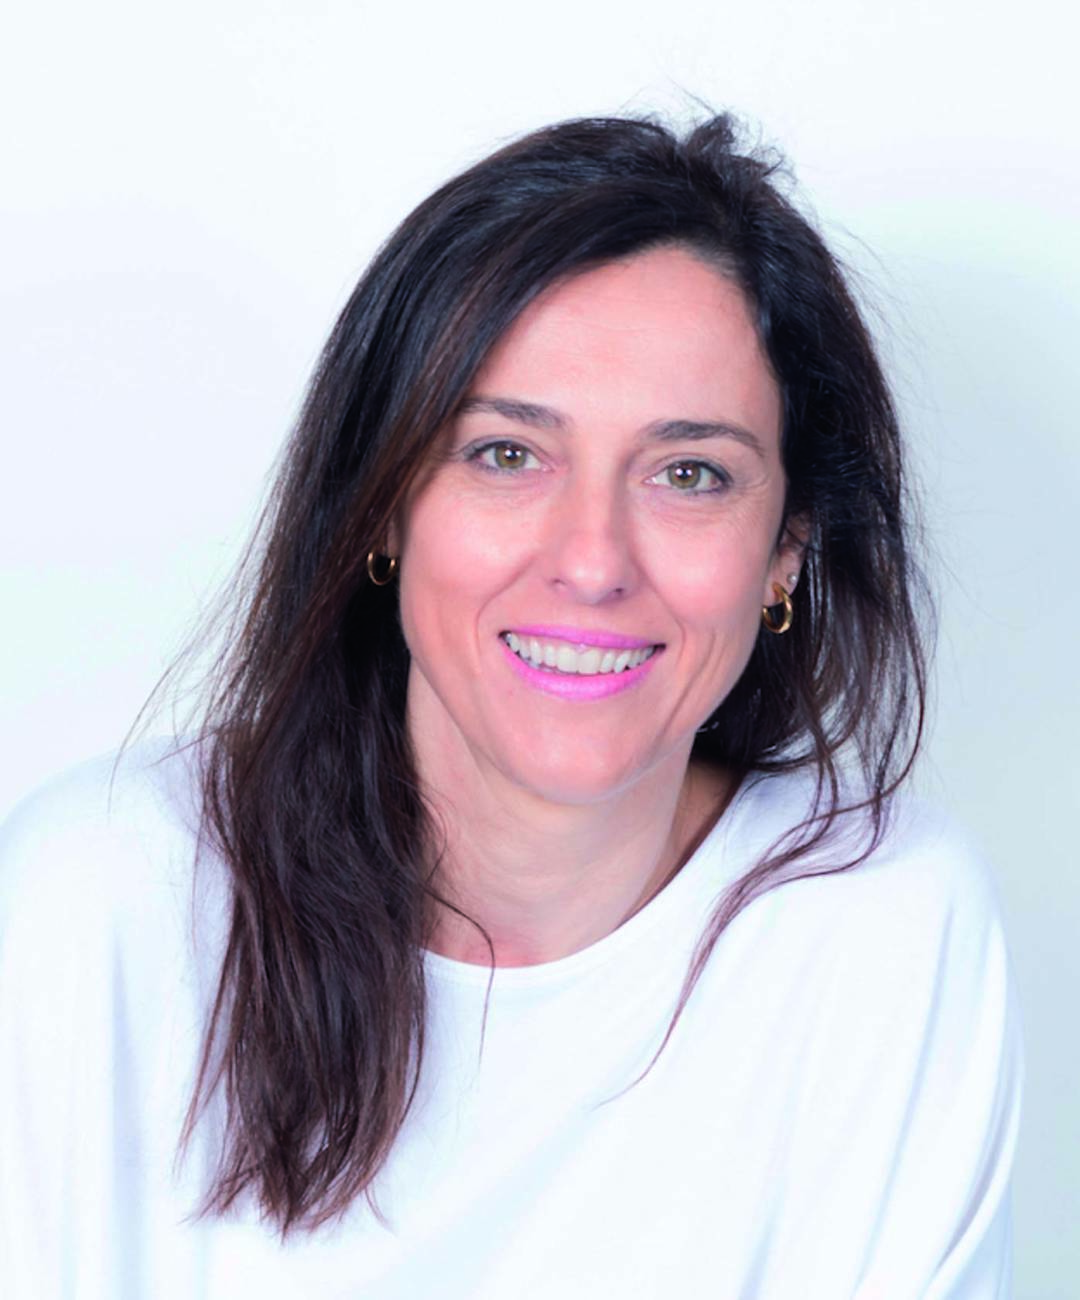 Dra. María Paz Salido Rodríguez-Manzaneque